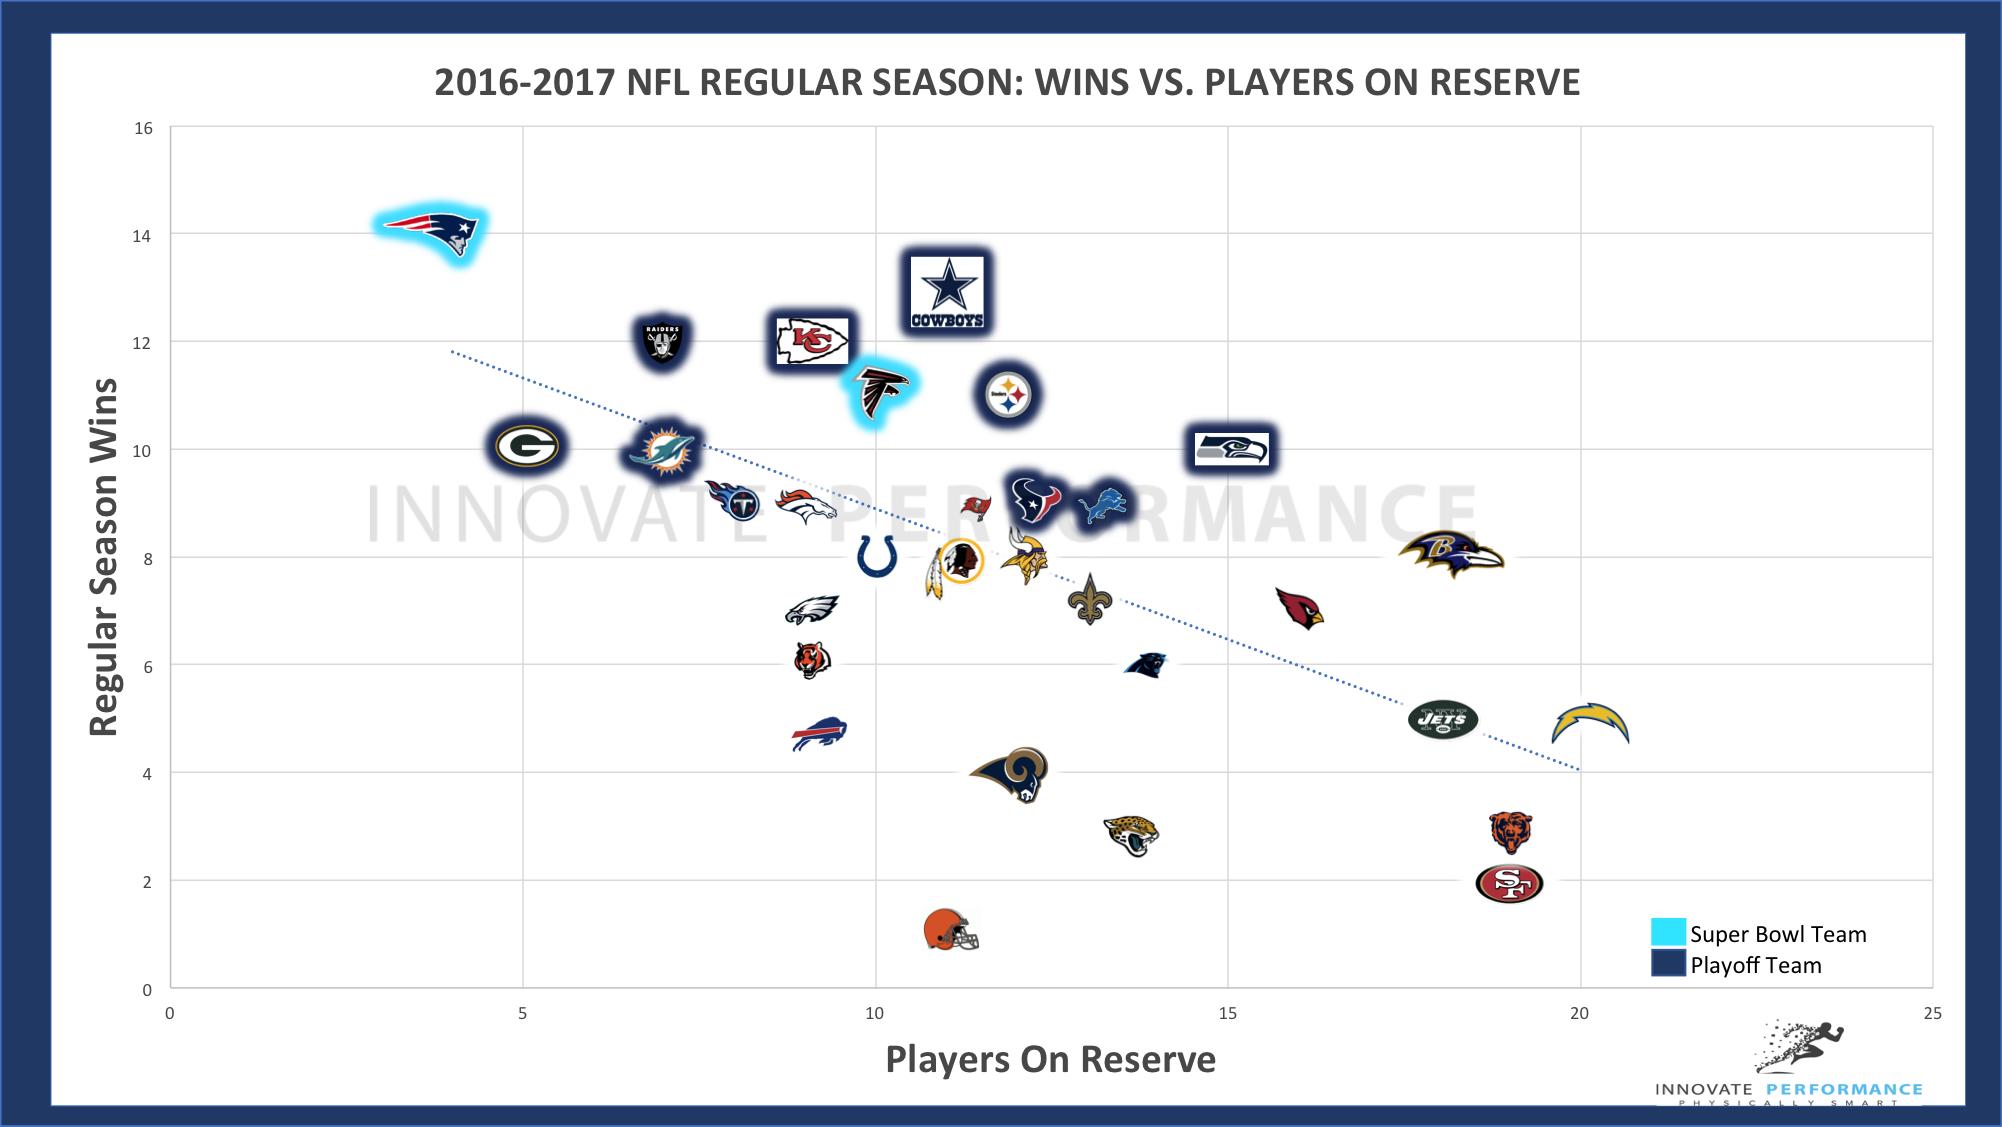 NFL Injuries versus Regular Season Wins